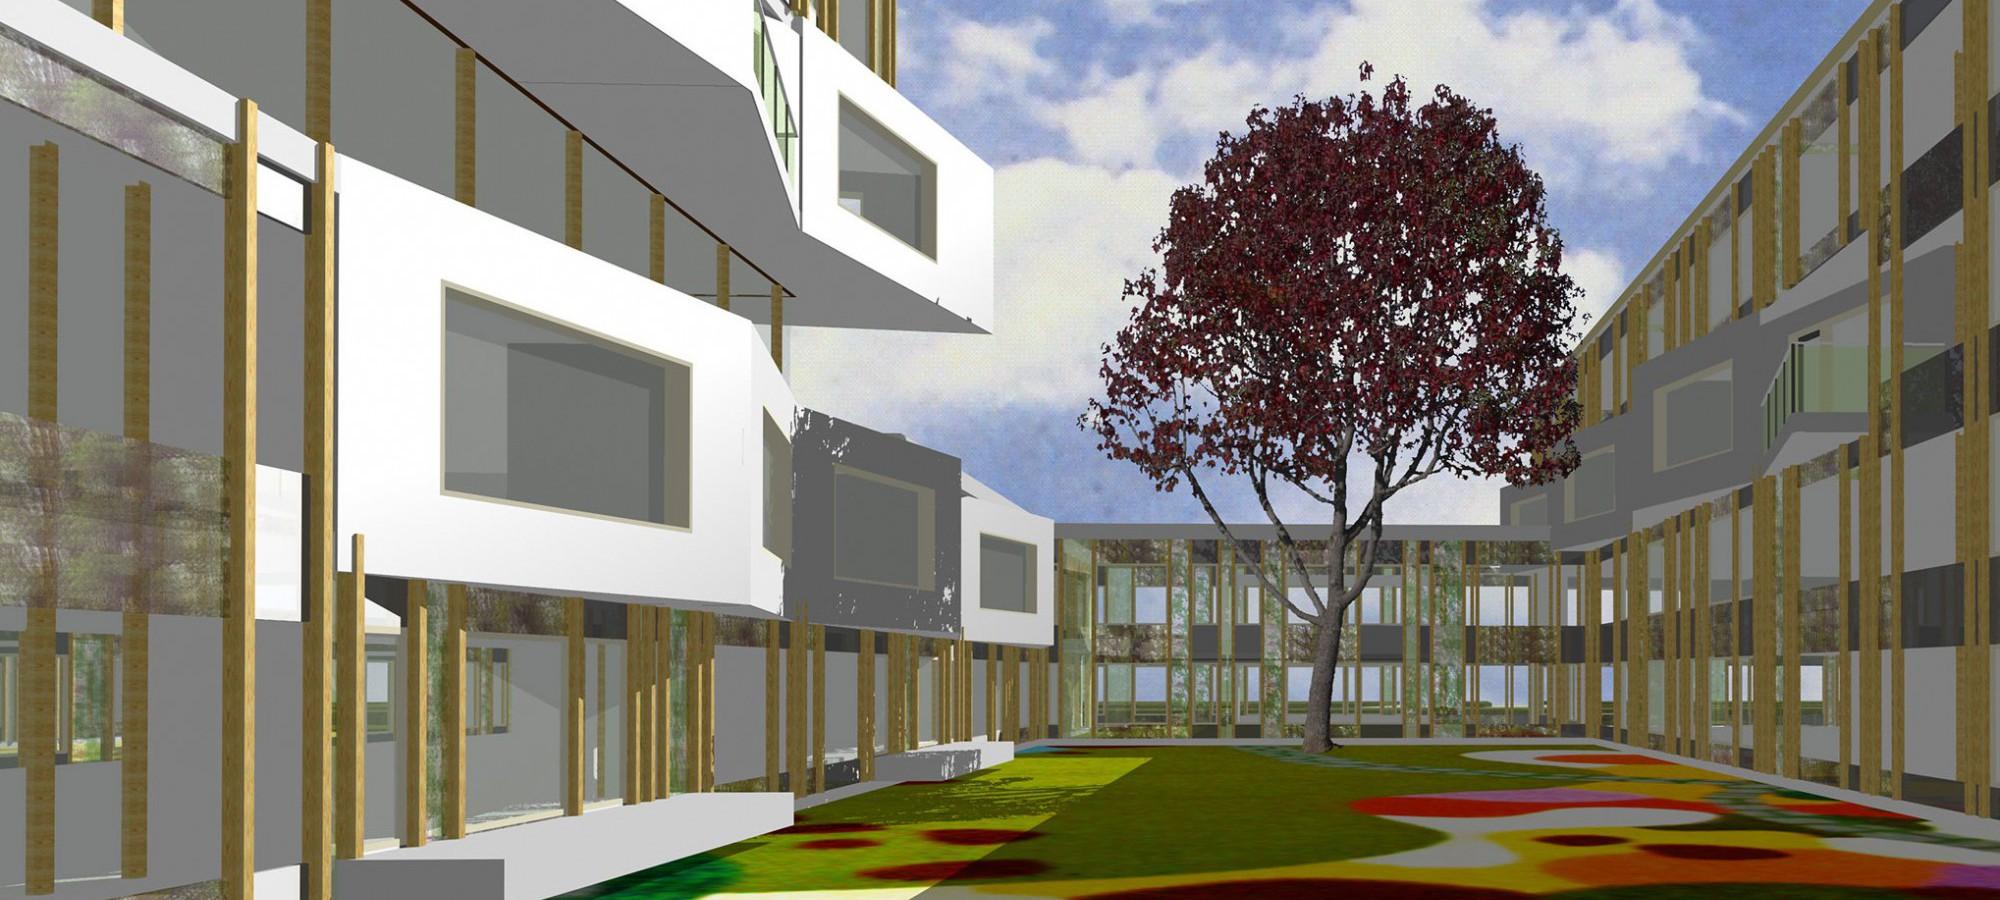 Rustoord, woonzorgcentrum, Voorburg